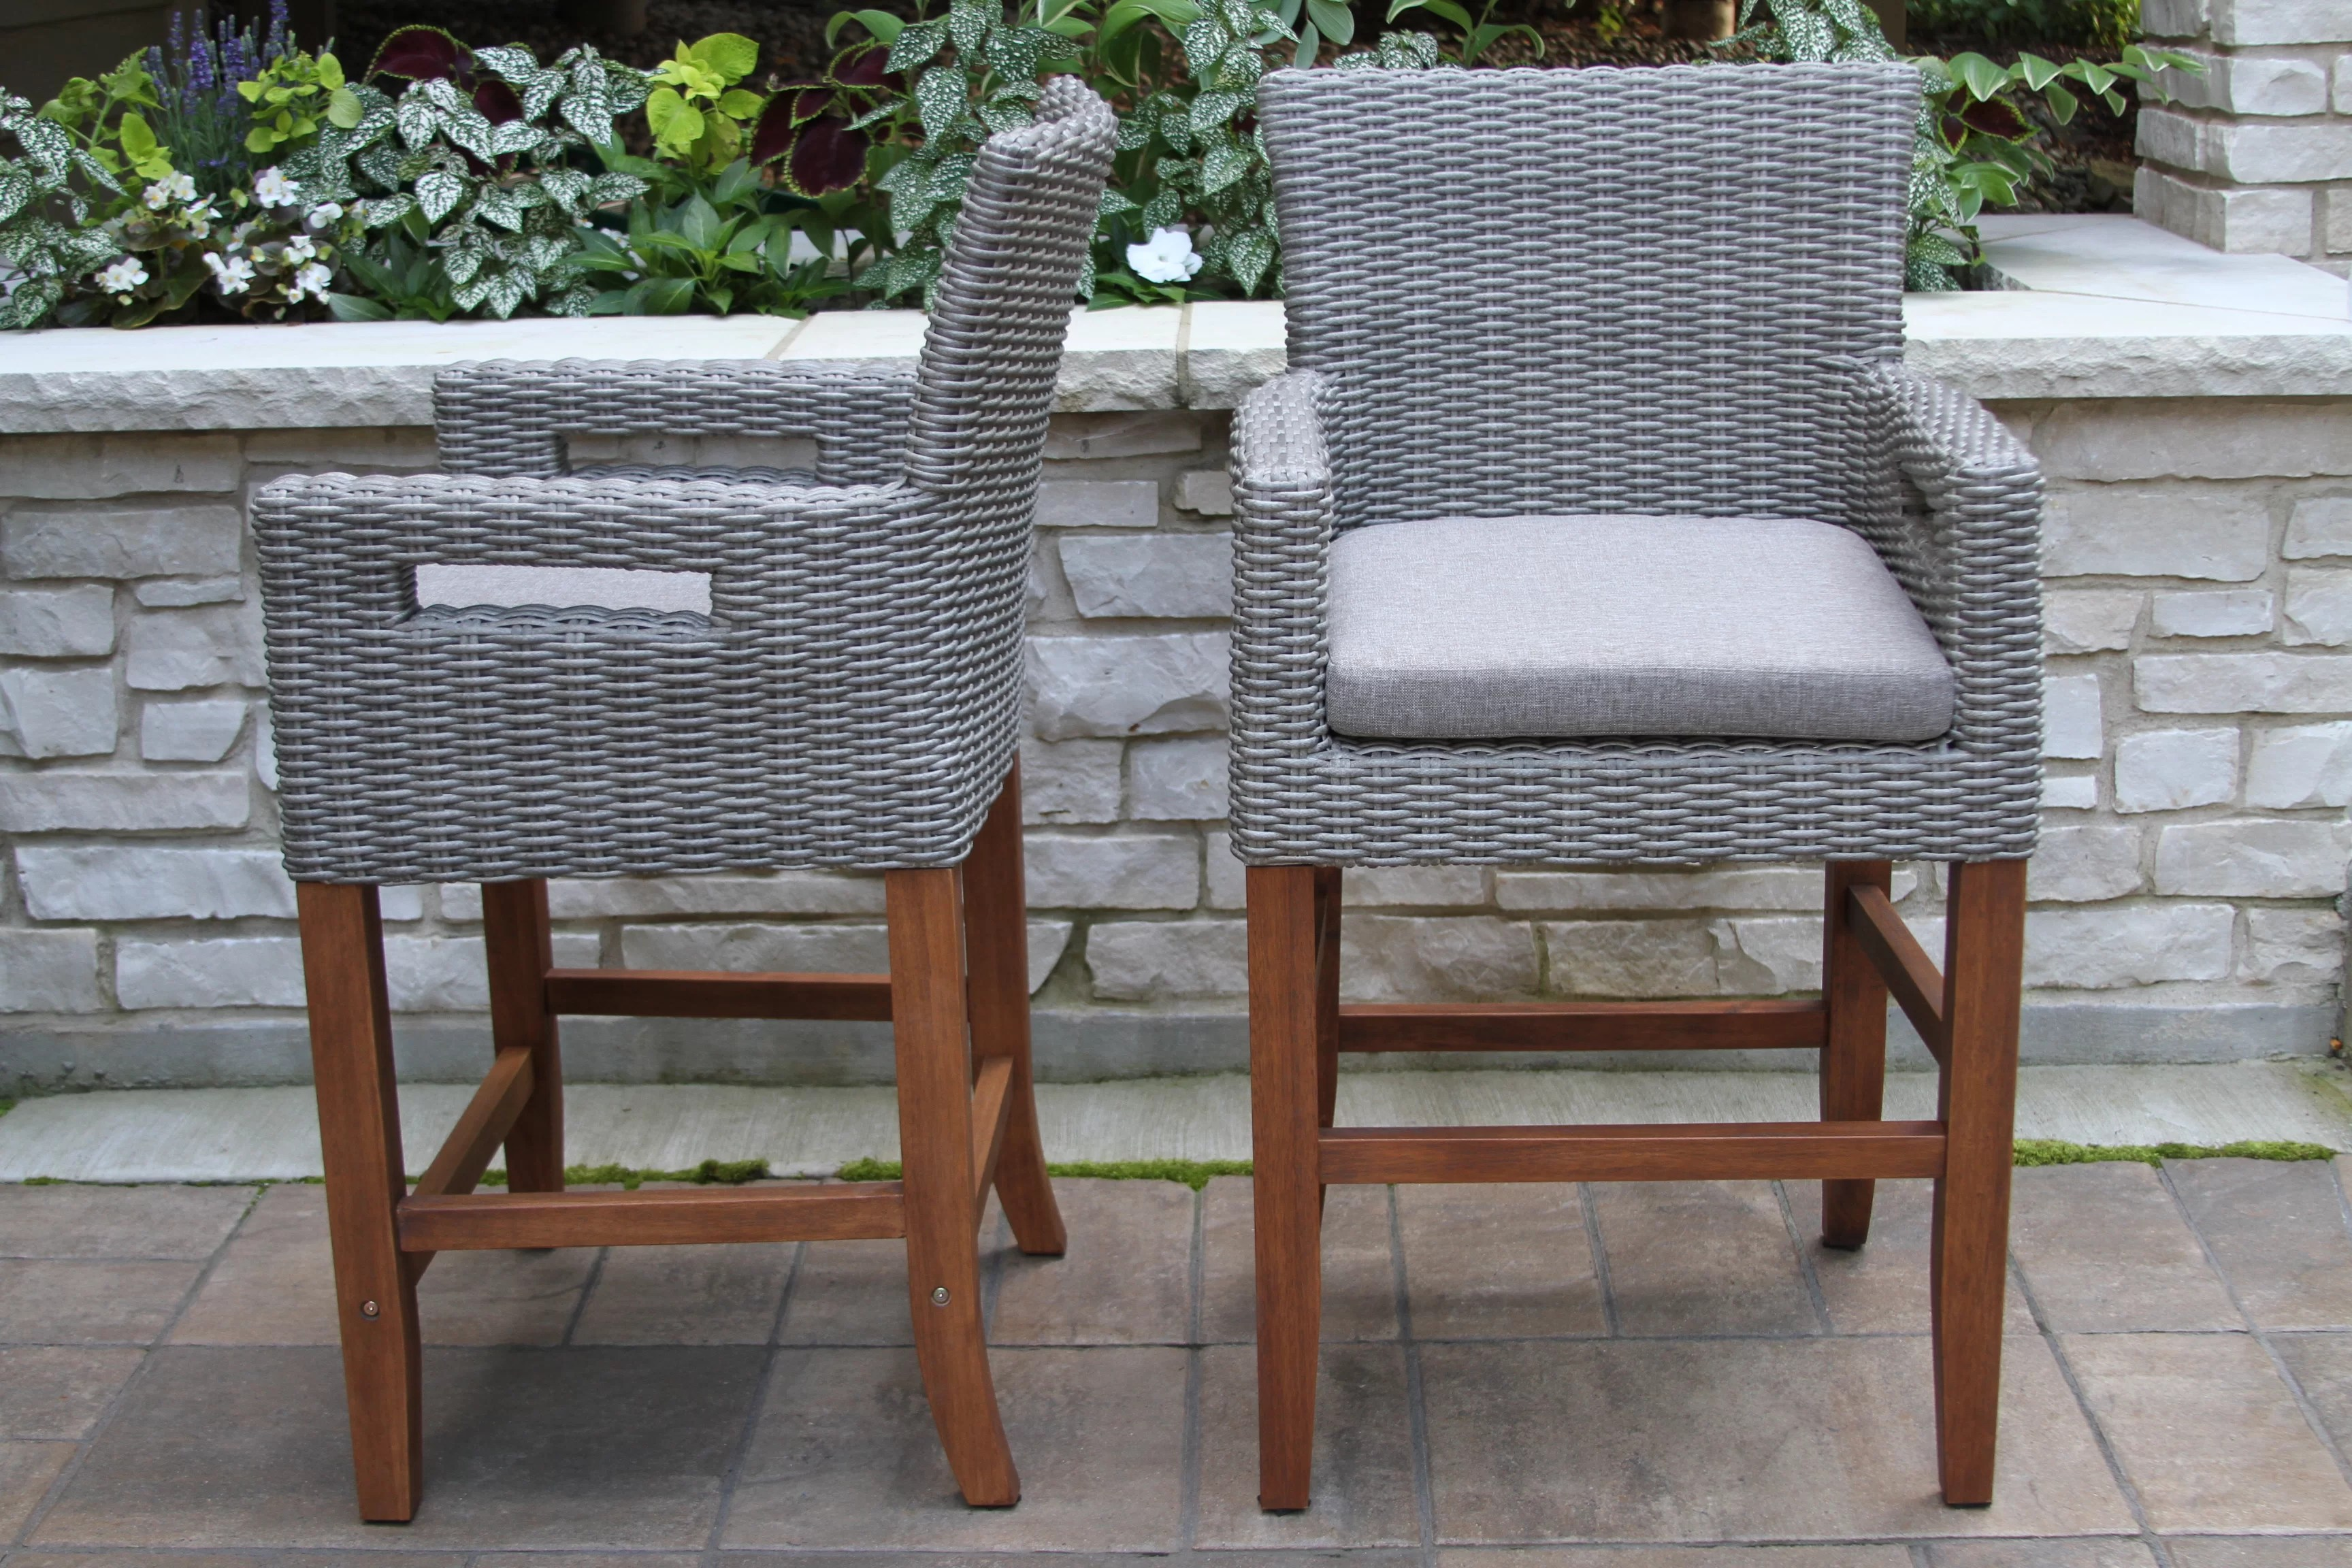 christiana 26 patio bar stool with